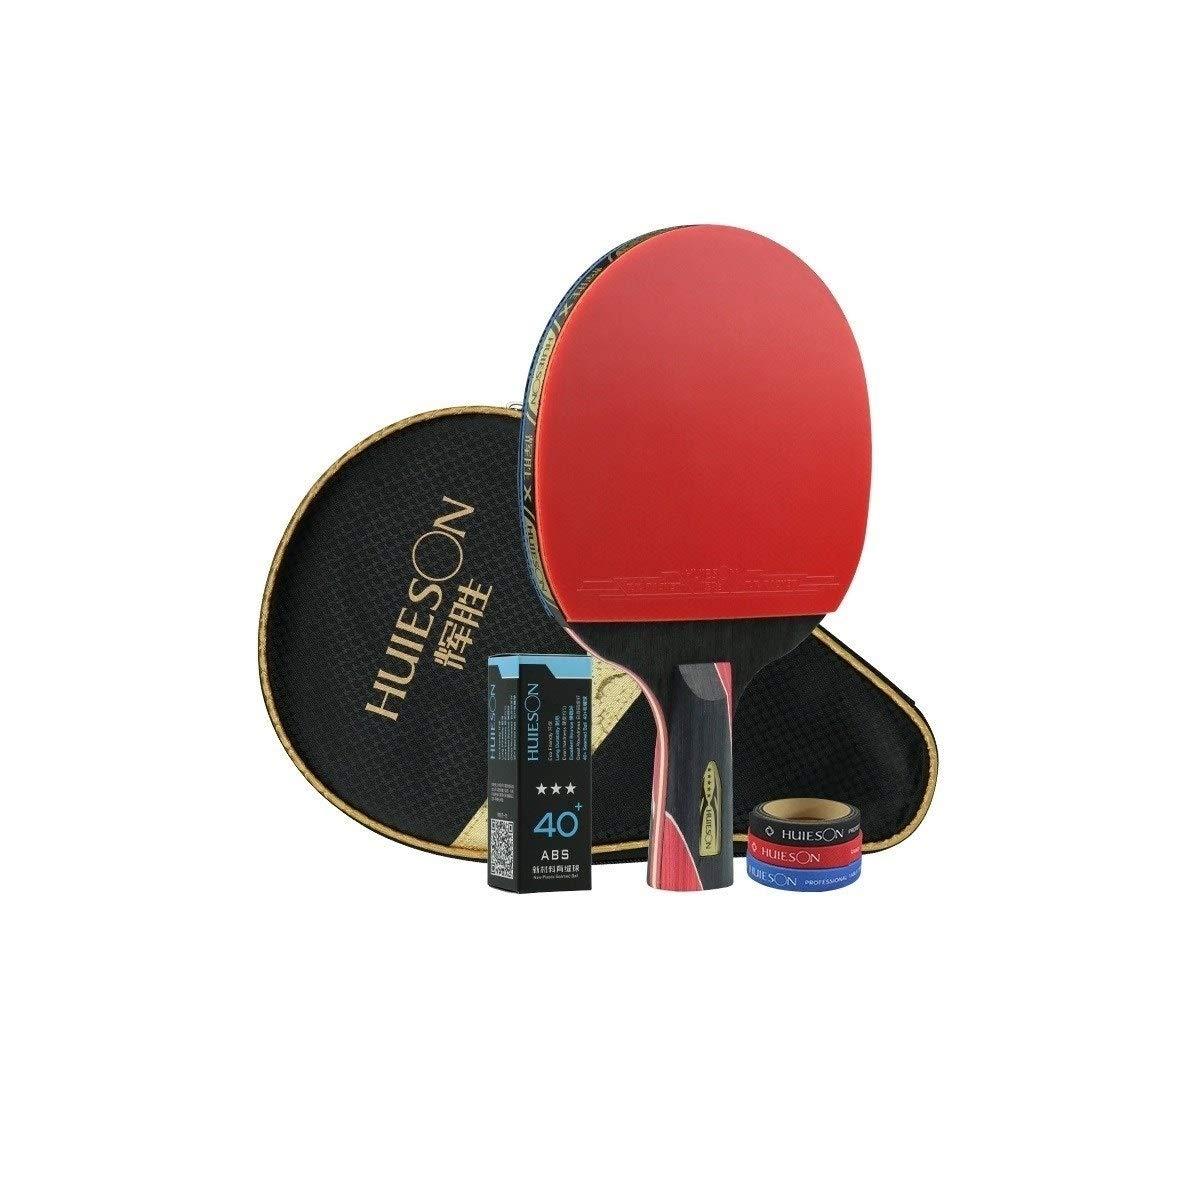 HUIJUNWENTI Five-Star Table Tennis Bat, Single Table Tennis, Horizontal Shot, Pen-Hold Professional Practice Shot Enlightenment Beginner Table Tennis Bat (Size : Pen-Hold) by HUIJUNWENTI